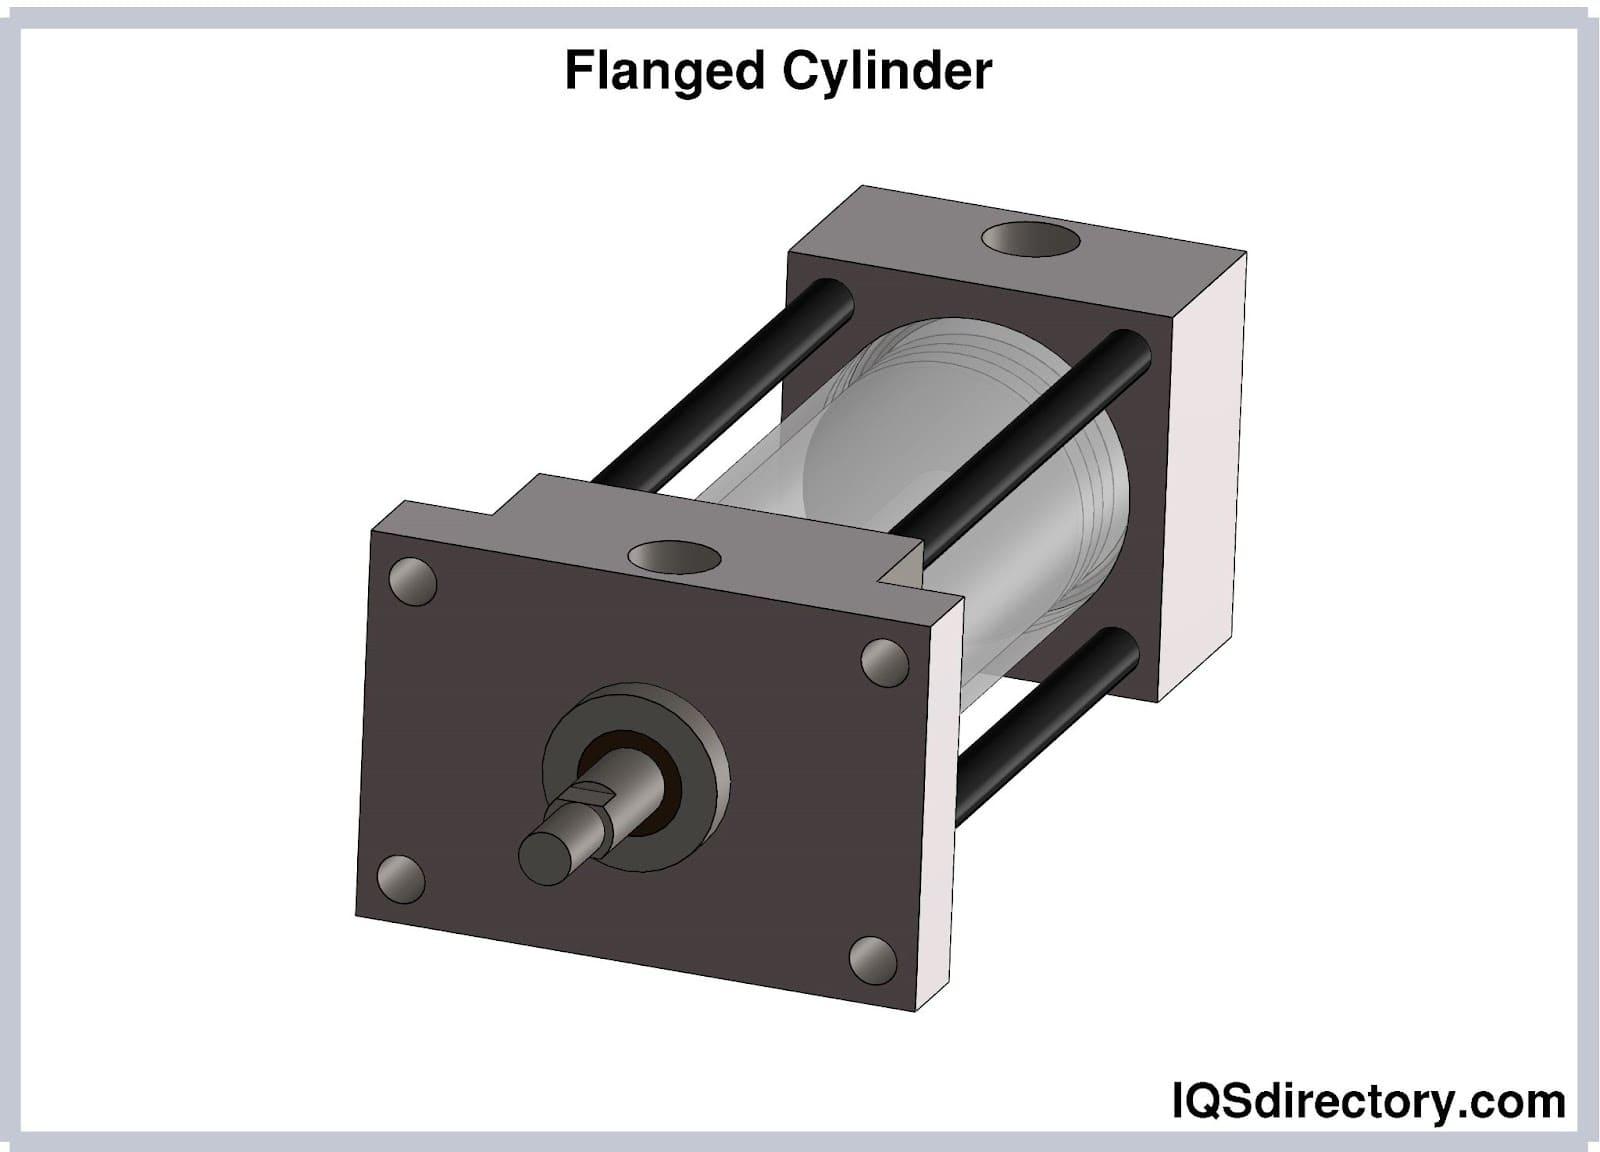 Flanged Cylinder